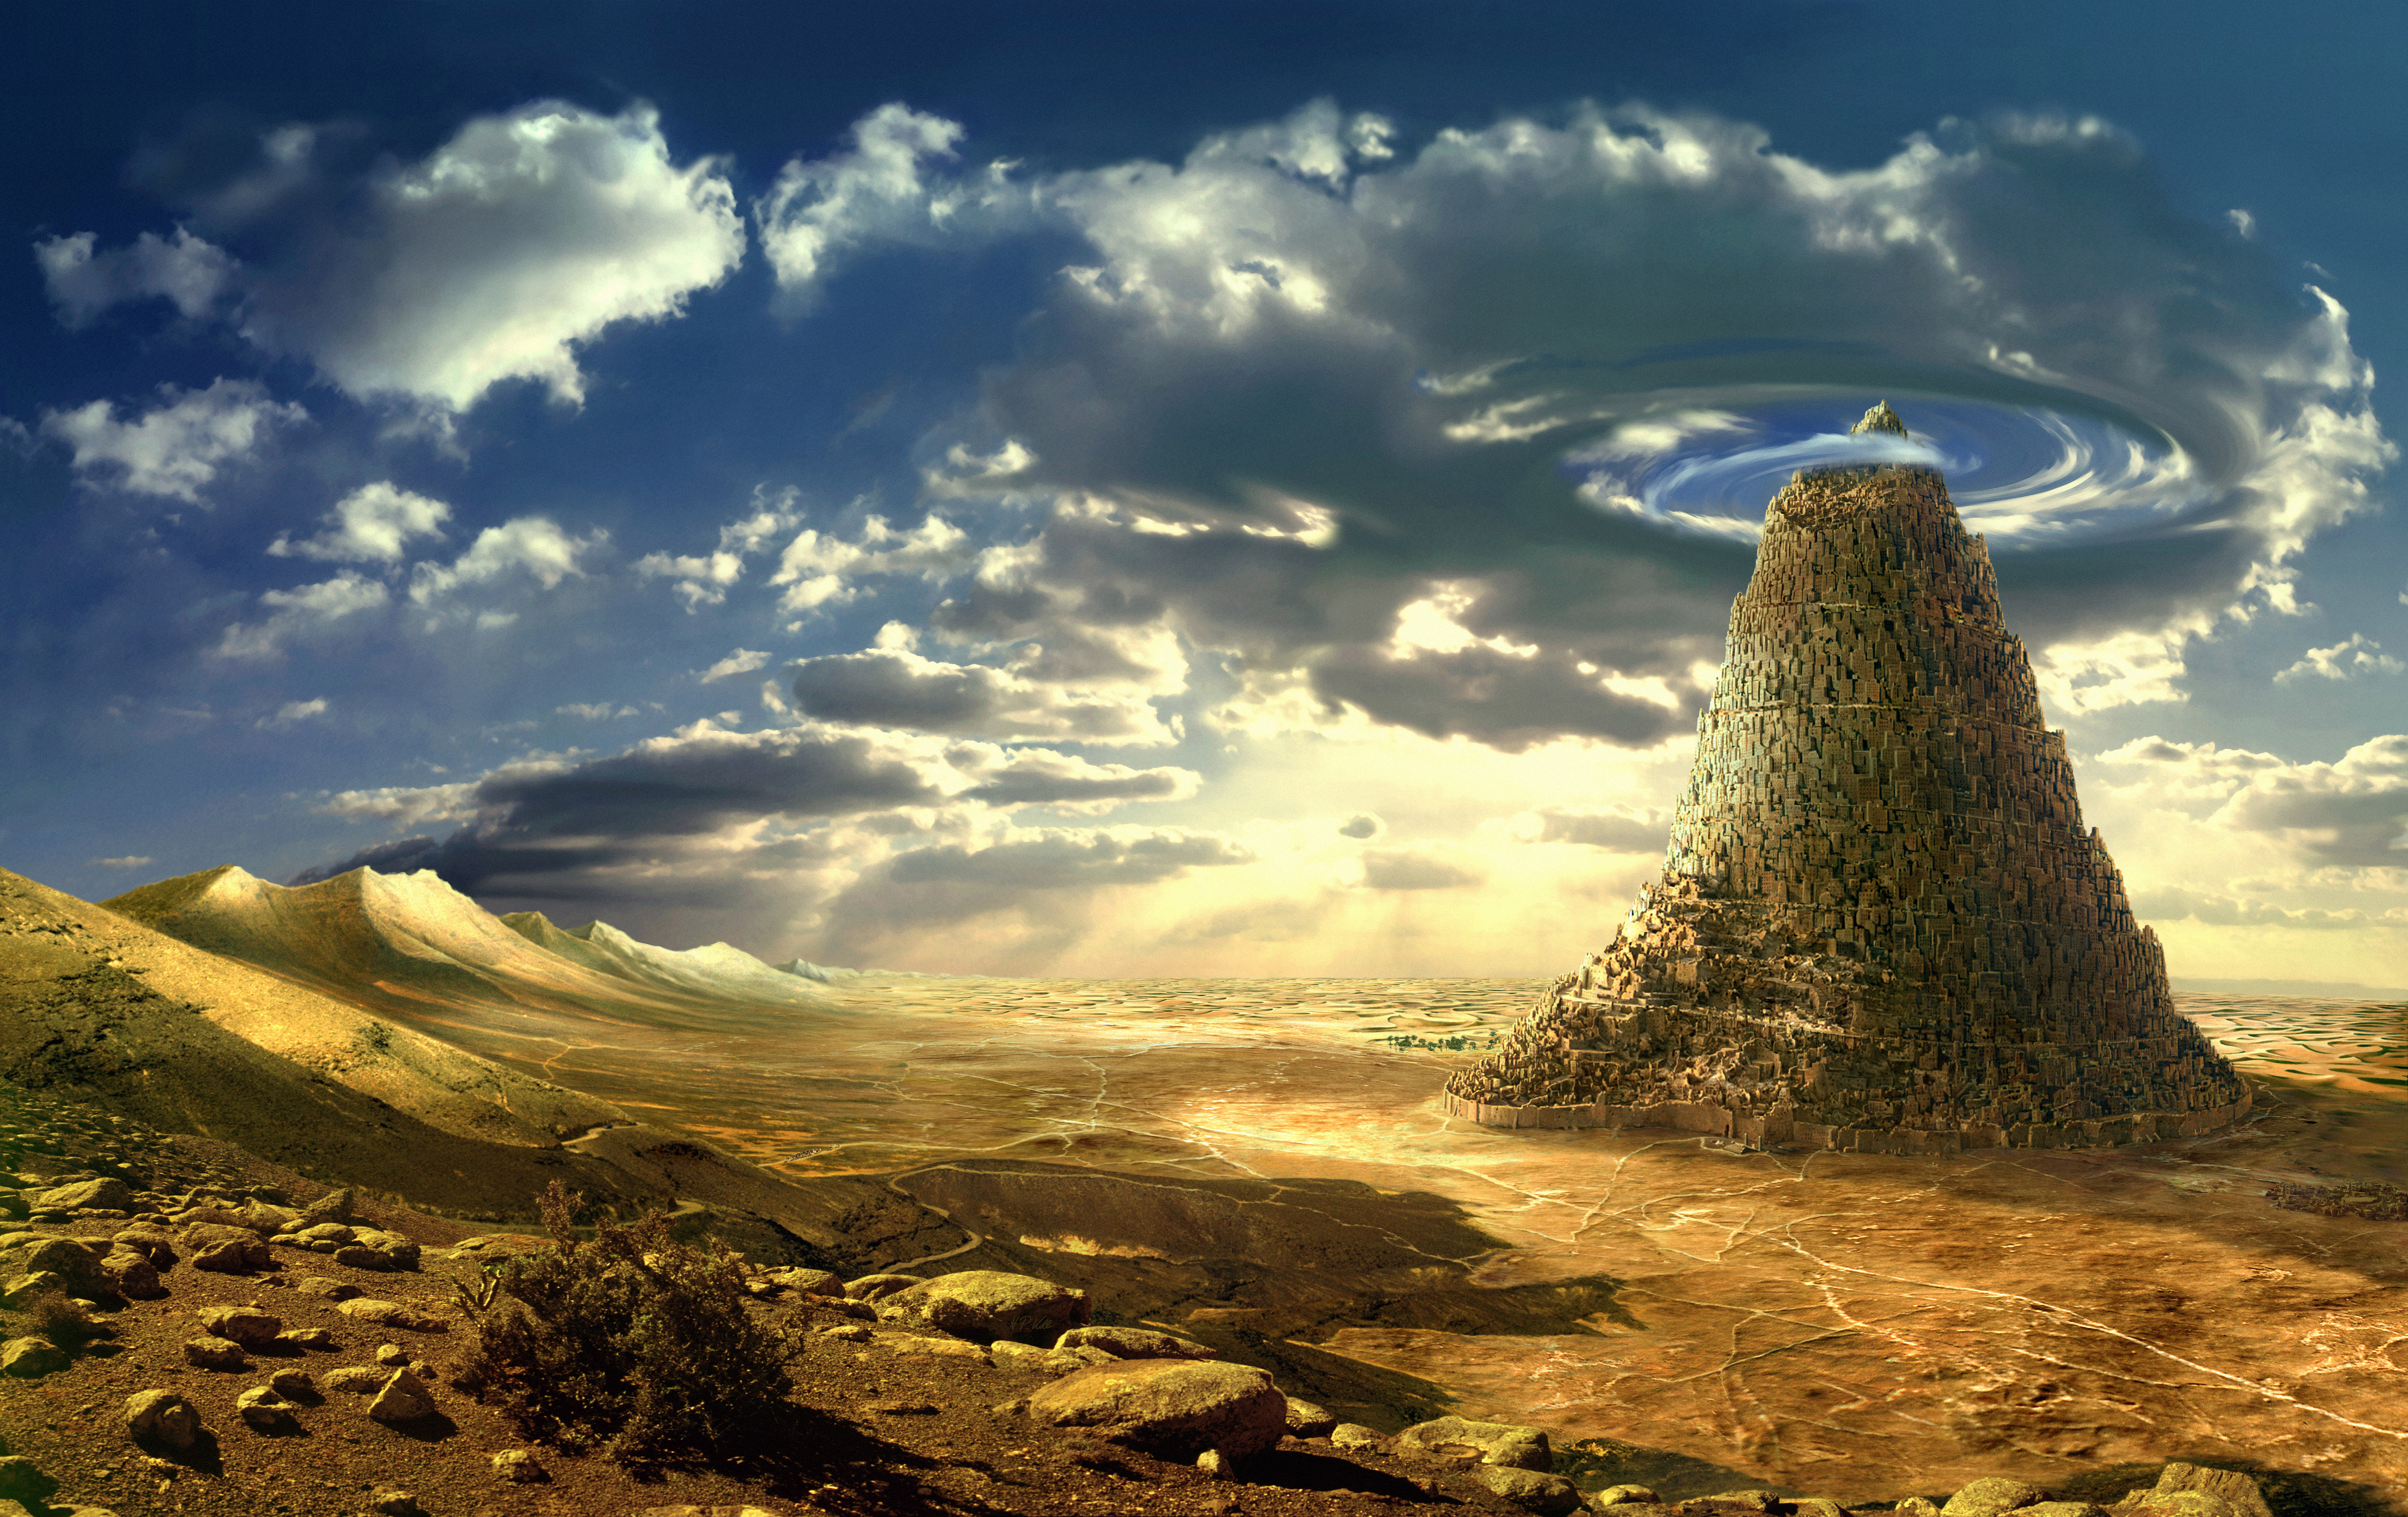 art-fantastika-pustynya-kamni (1)